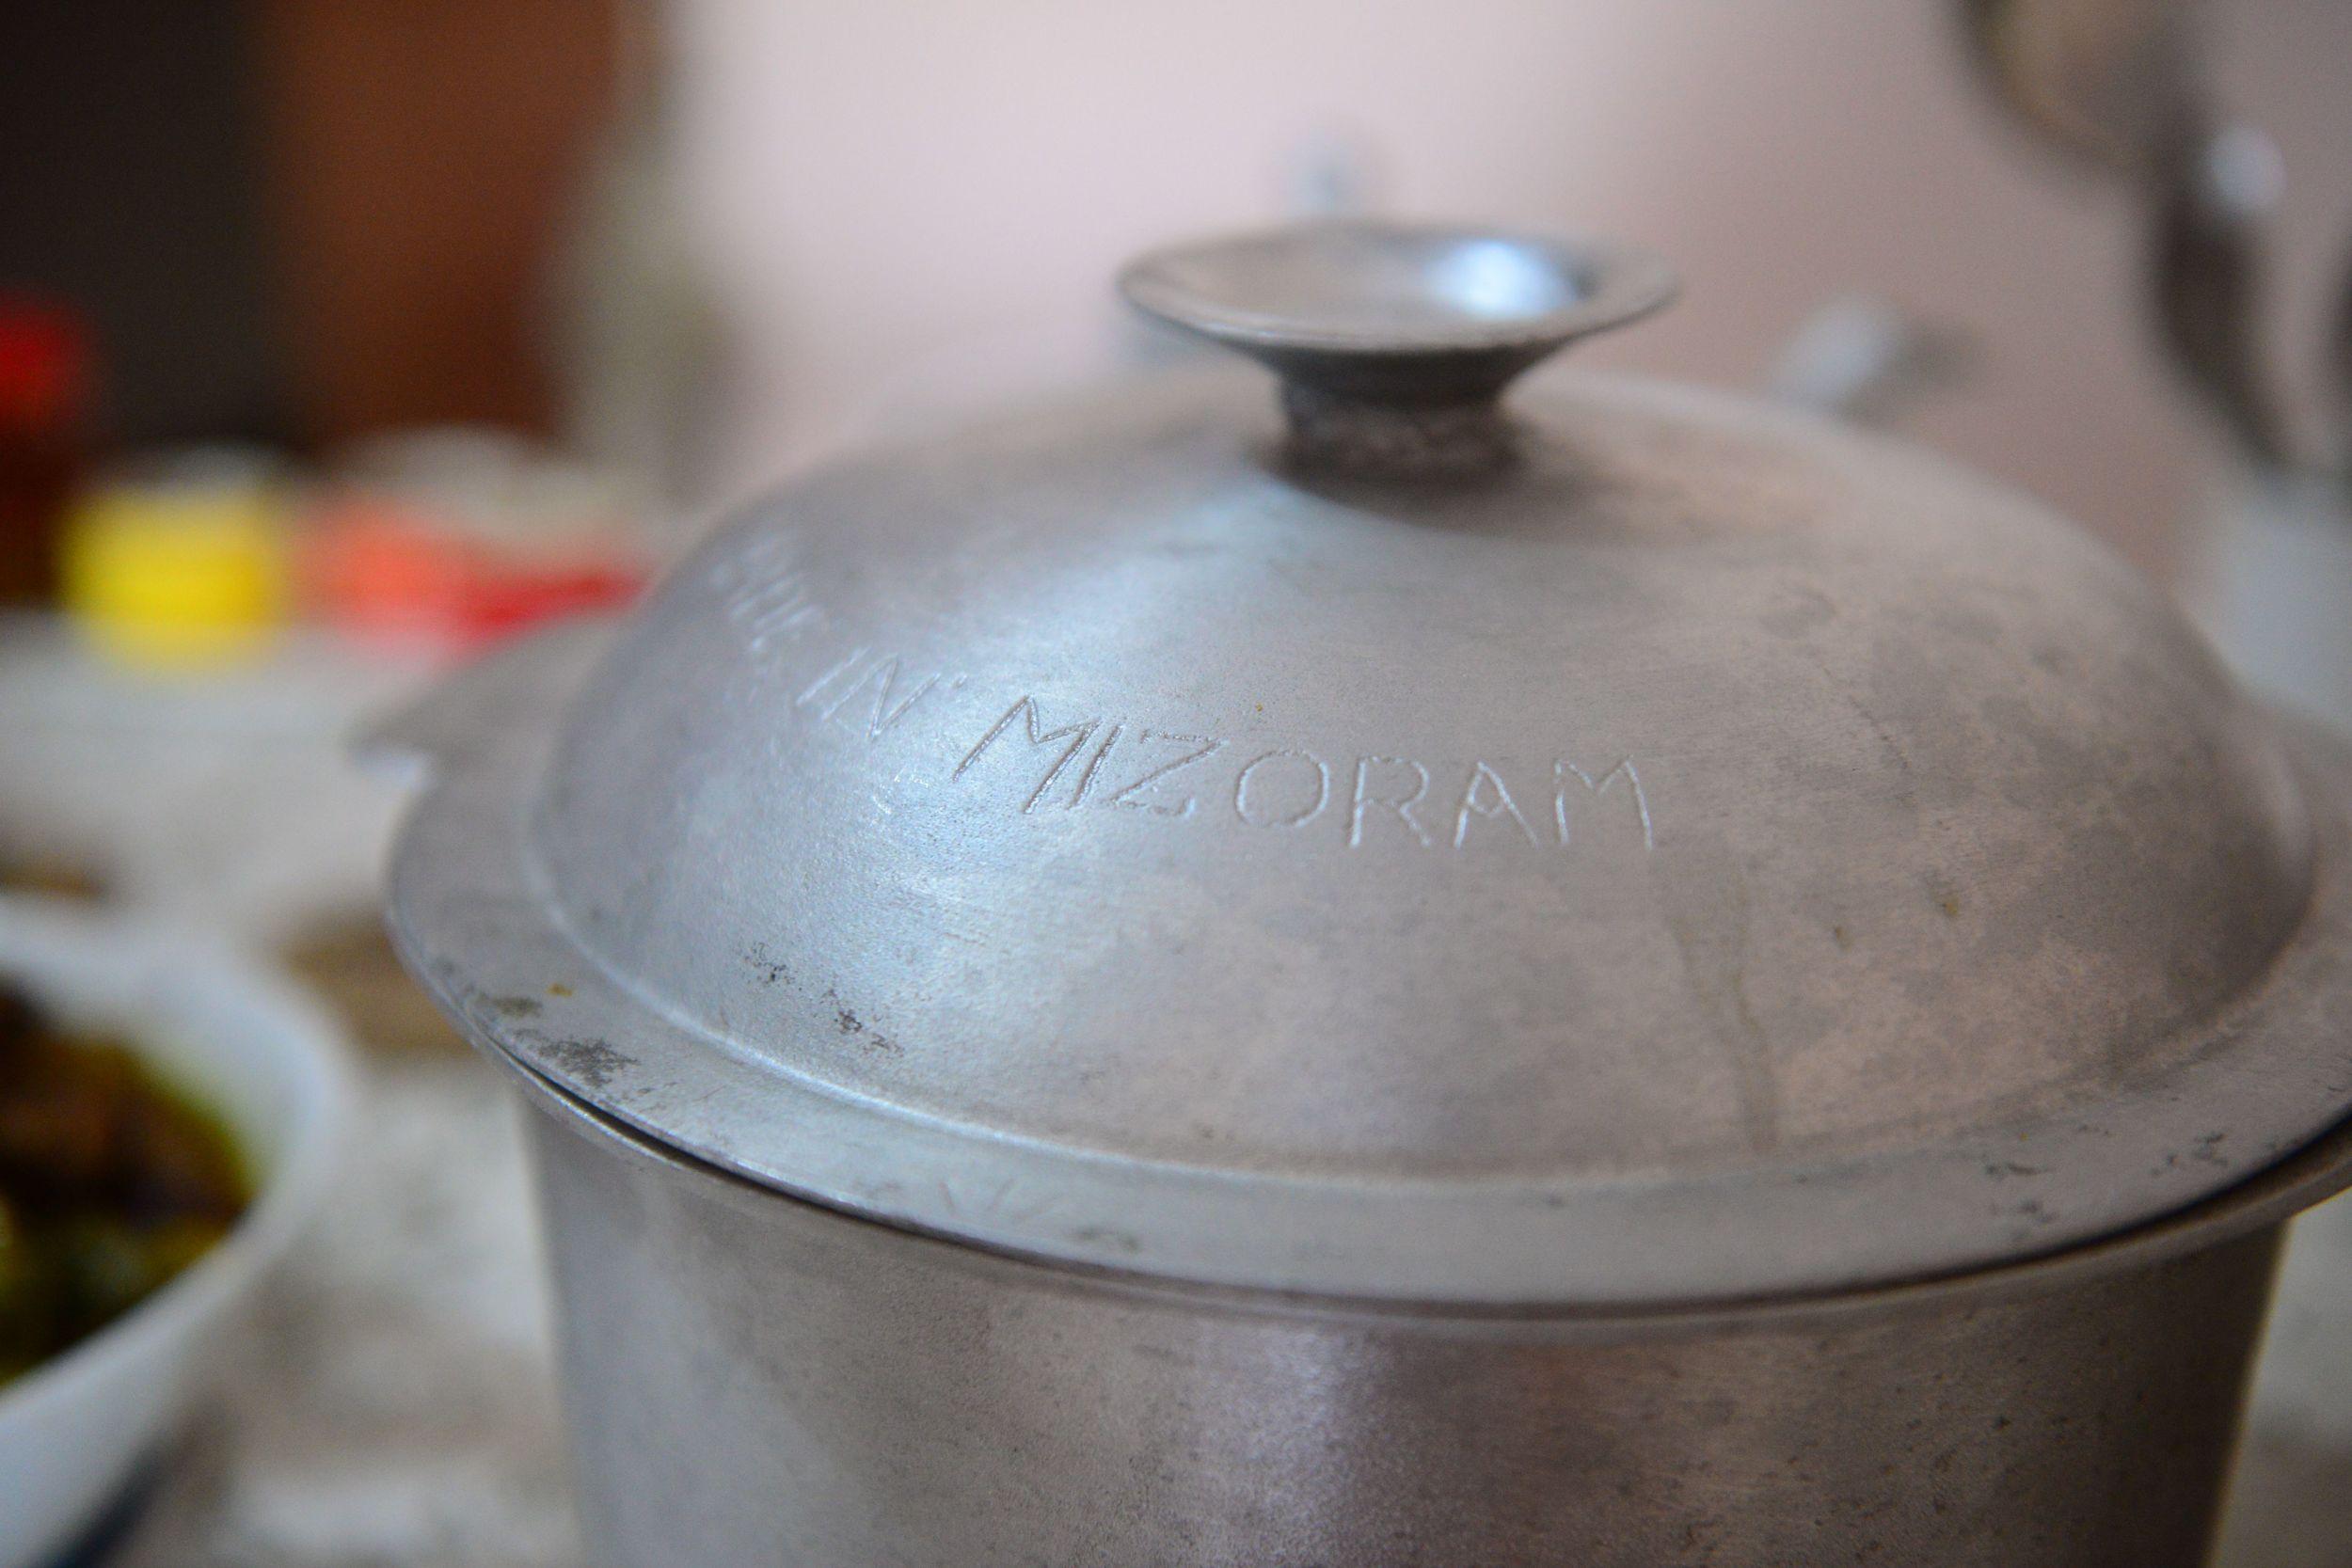 Pot from Mizoram